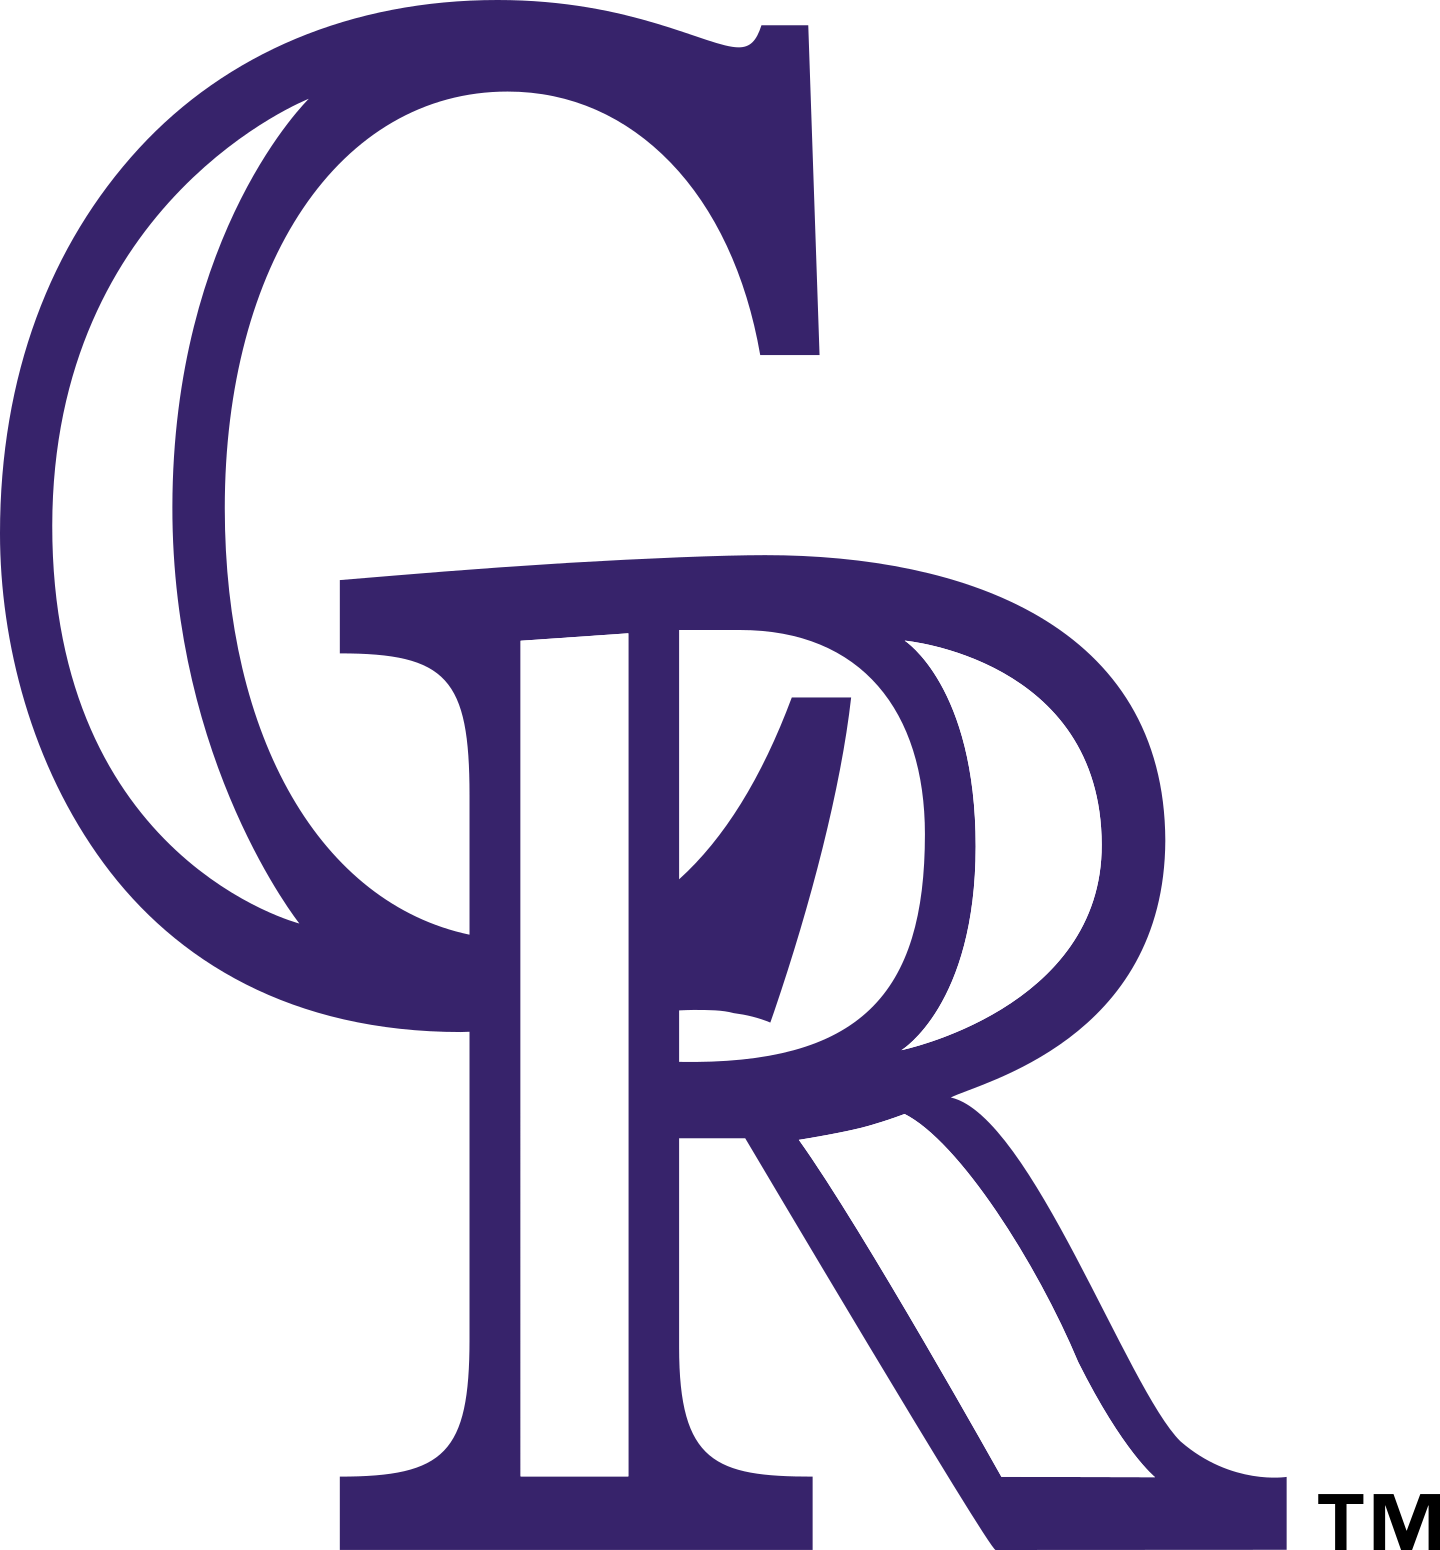 colorado rockies logo 2 - Colorado Rockies Logo